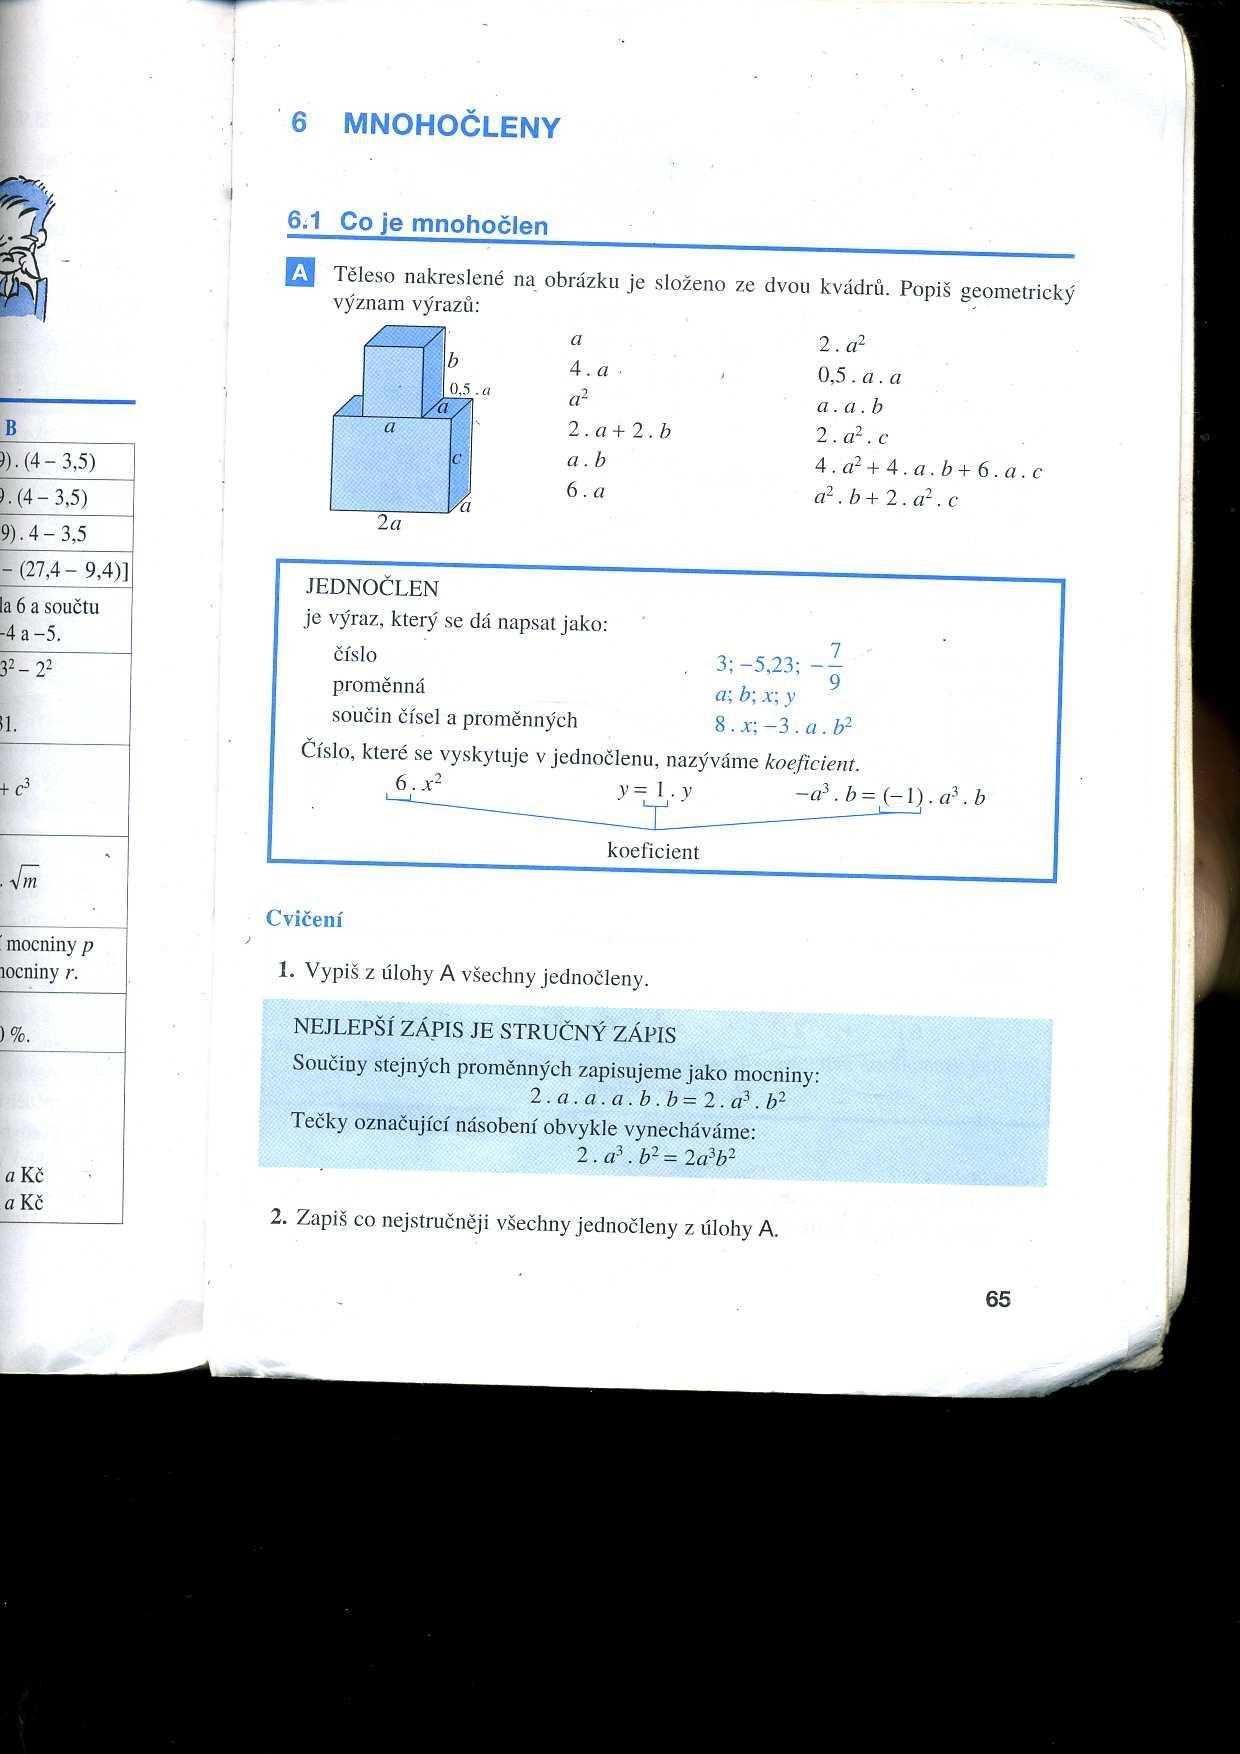 http://forum.matematika.cz/upload3/img/2014-12/41355_Odvarko-mnohocleny-page-001.jpg